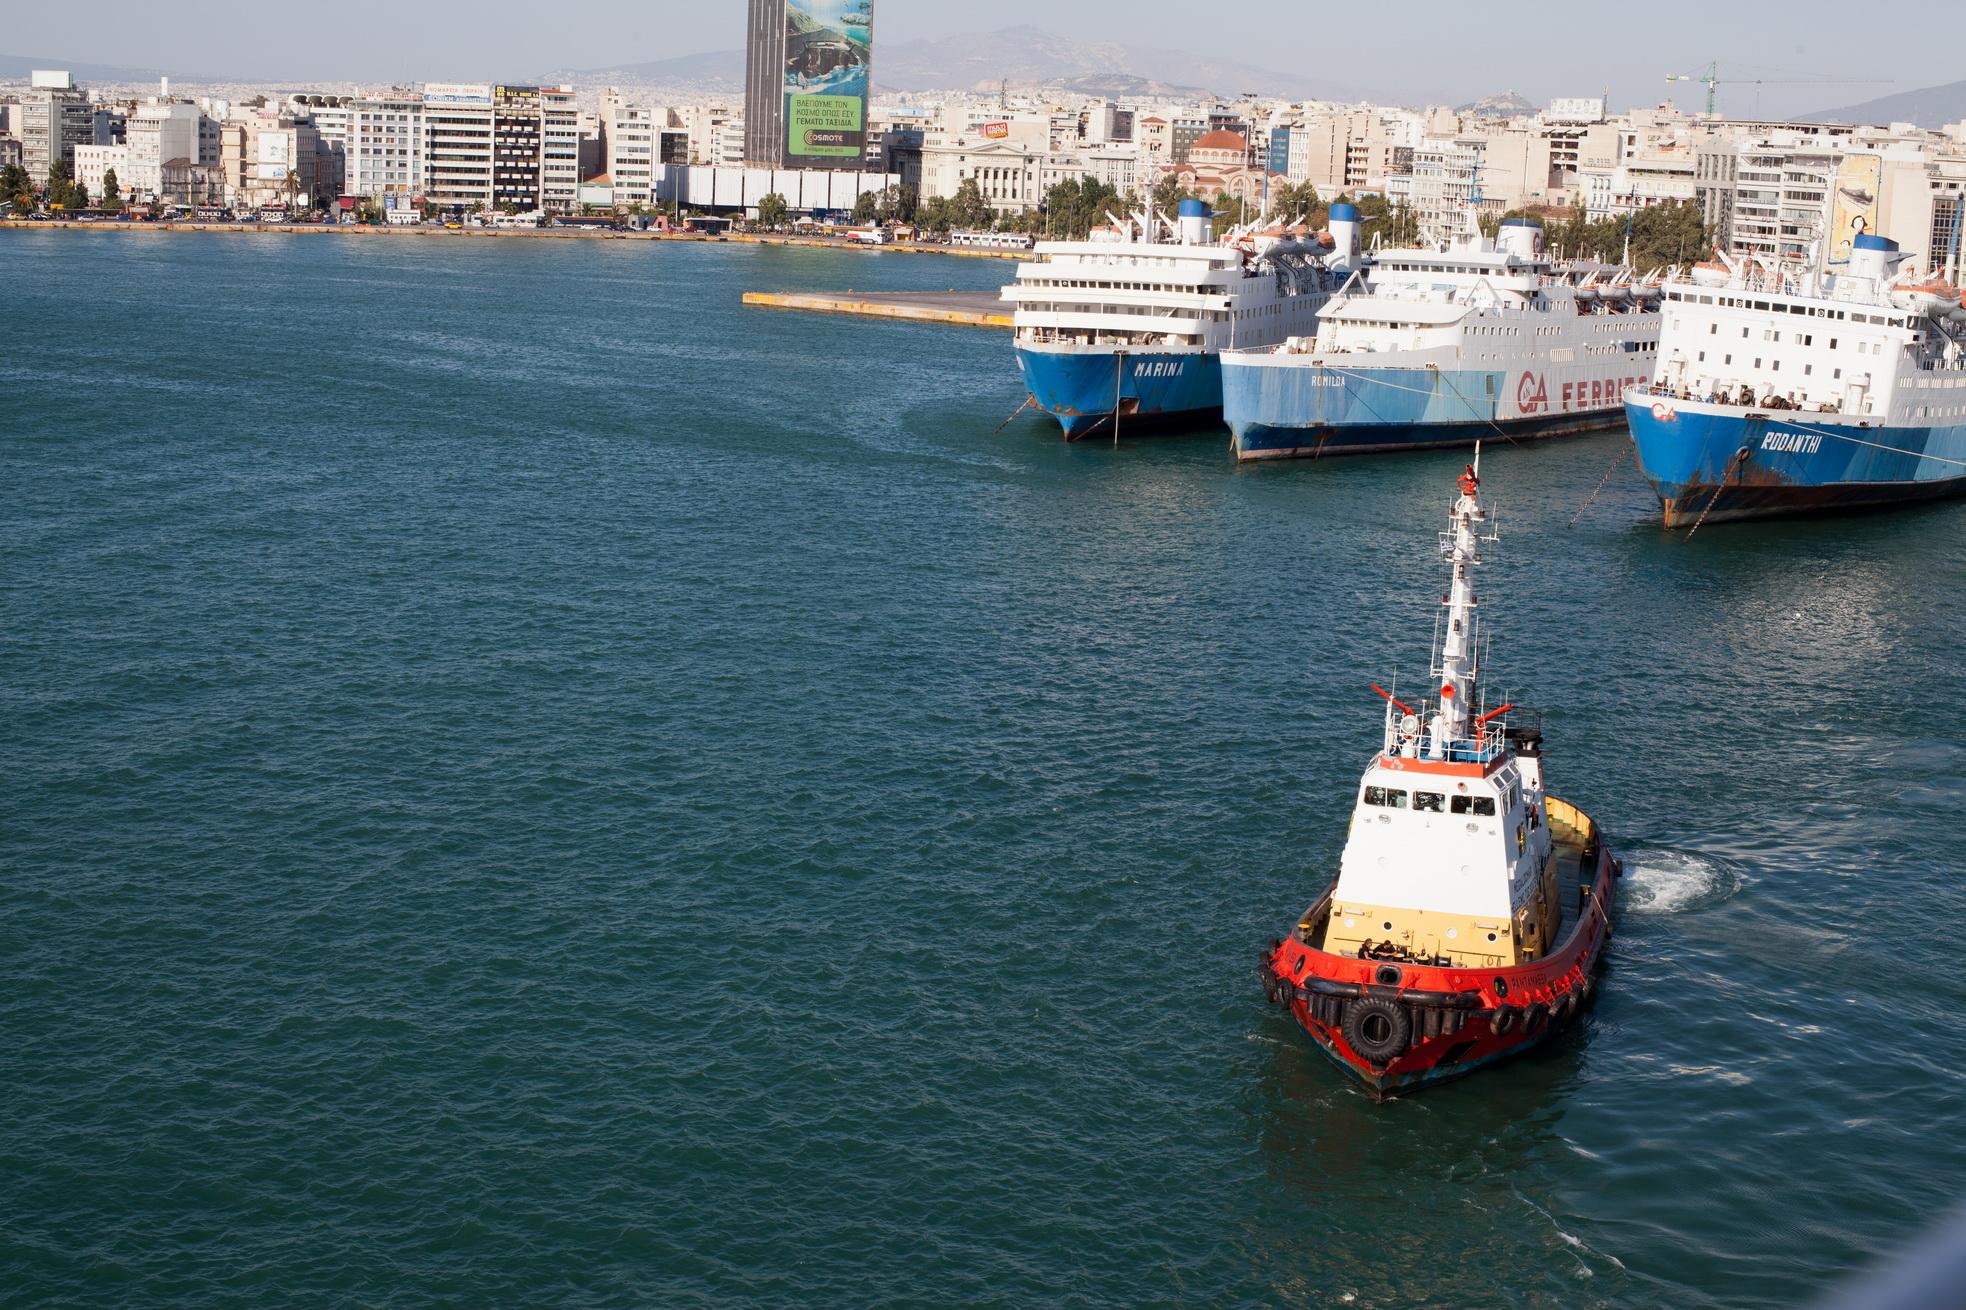 MS Romilda IMO 7368499 Marina Rodanthi GA Ferries docked Piraeus Port of Athens Greece 02